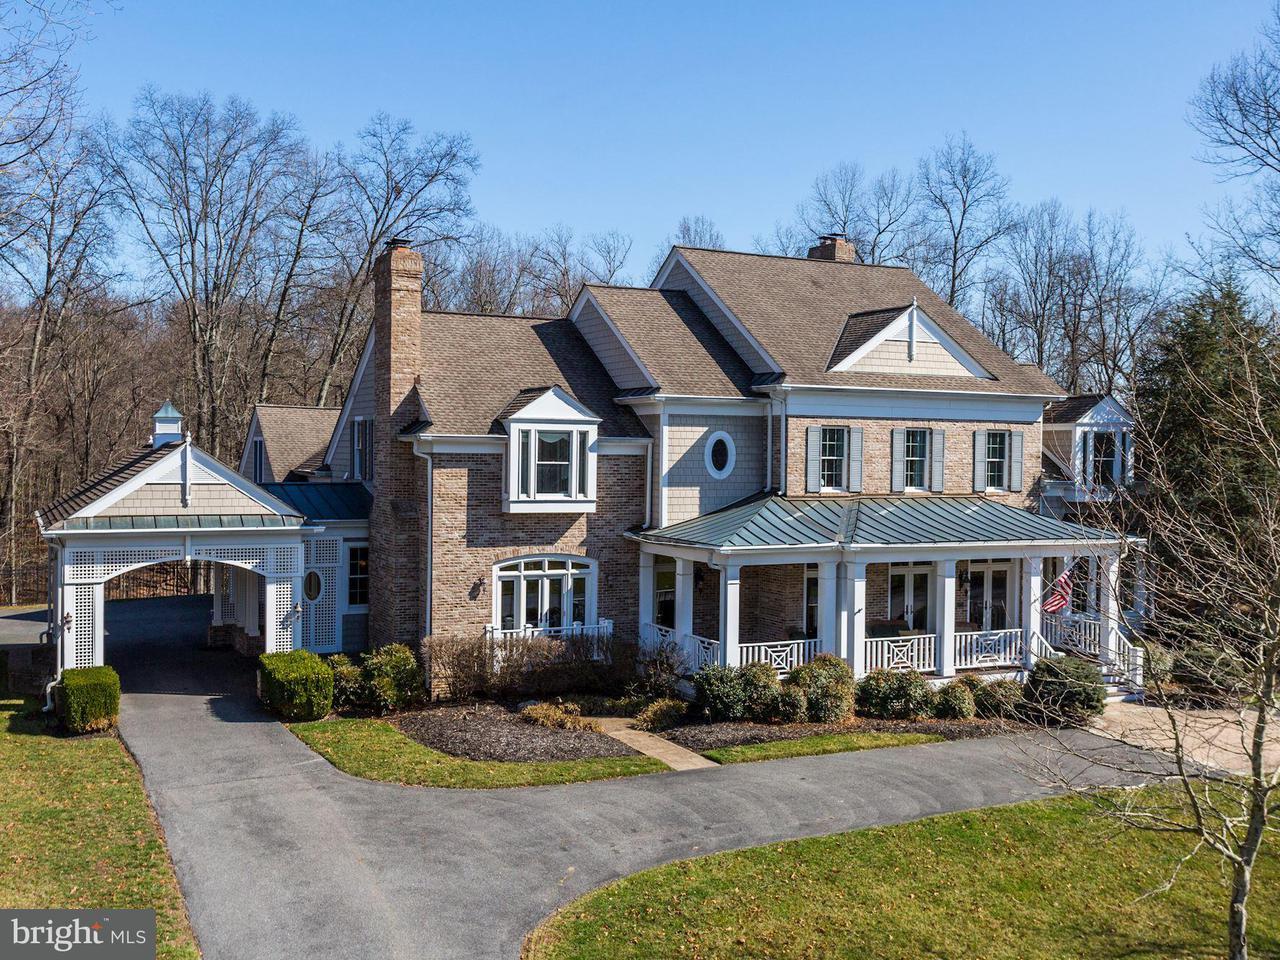 独户住宅 为 销售 在 2948 Hunt Valley Drive 2948 Hunt Valley Drive Glenwood, 马里兰州 21738 美国